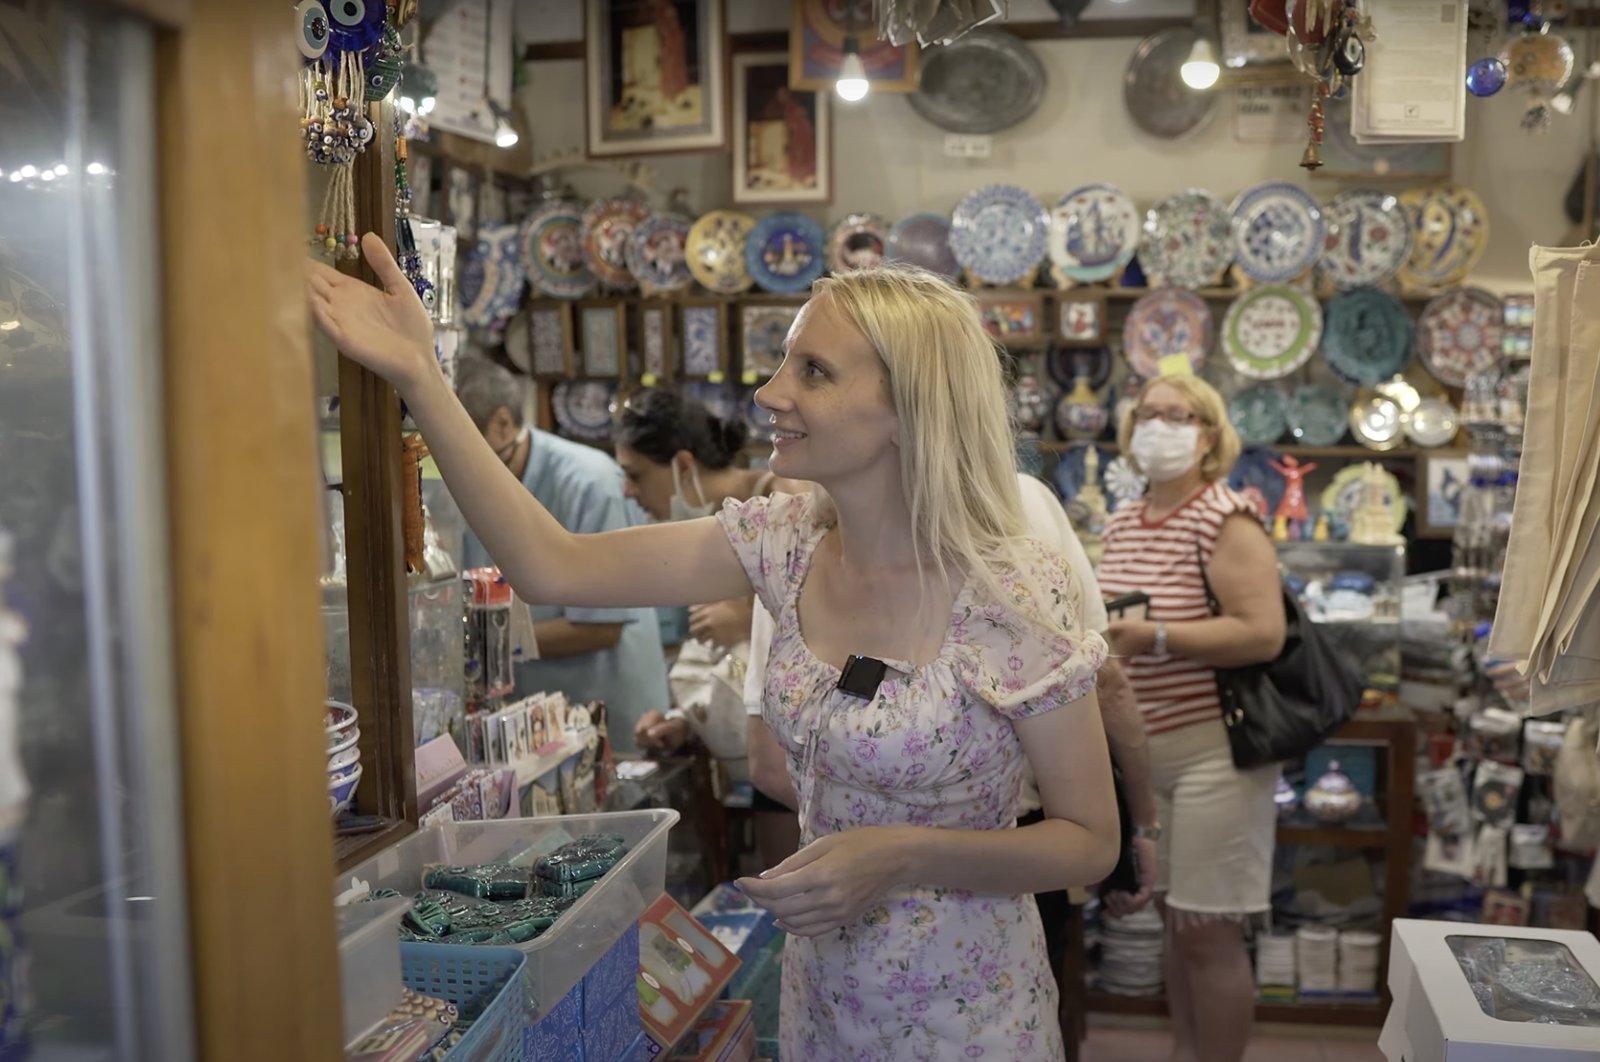 YouTuber Chelsea Elizabeth inspects items in a shop in Izmir, Turkey. (Photo from YouTube's Chelsea Elizabeth)